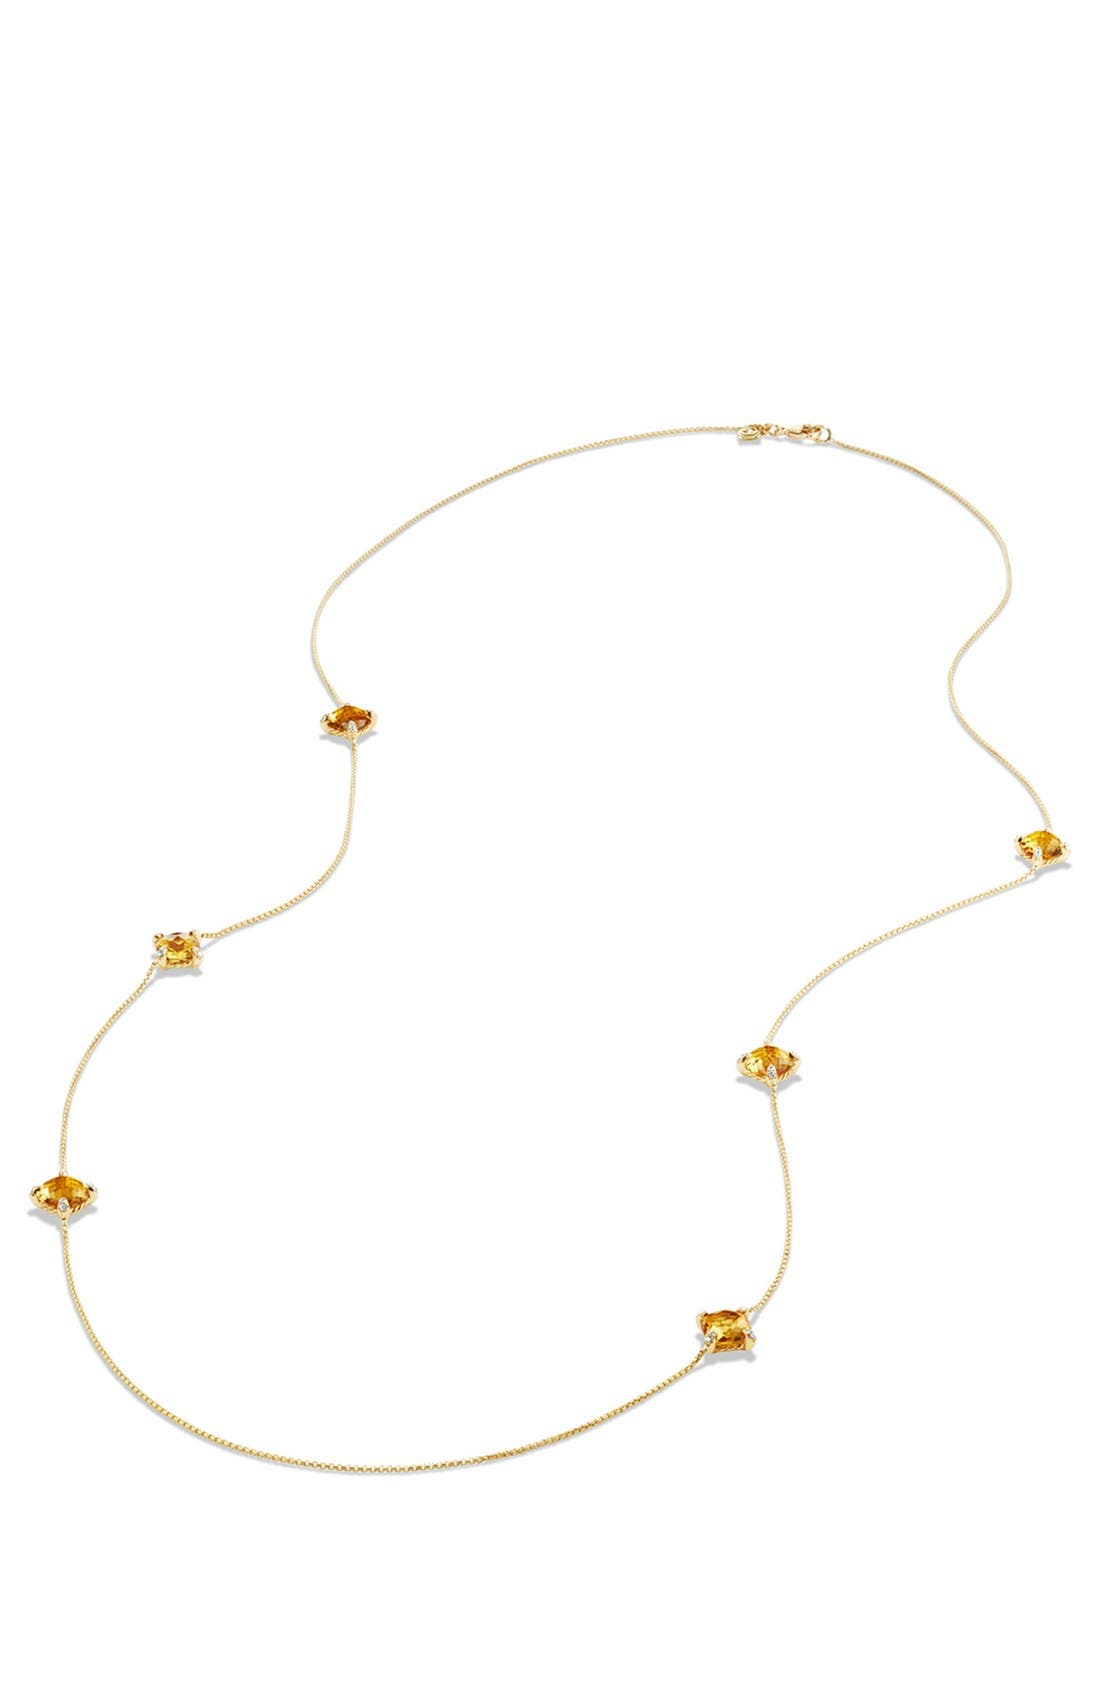 'Châtelaine' Long Semiprecious Stone Necklace with Diamonds,                             Alternate thumbnail 3, color,                             CITRINE